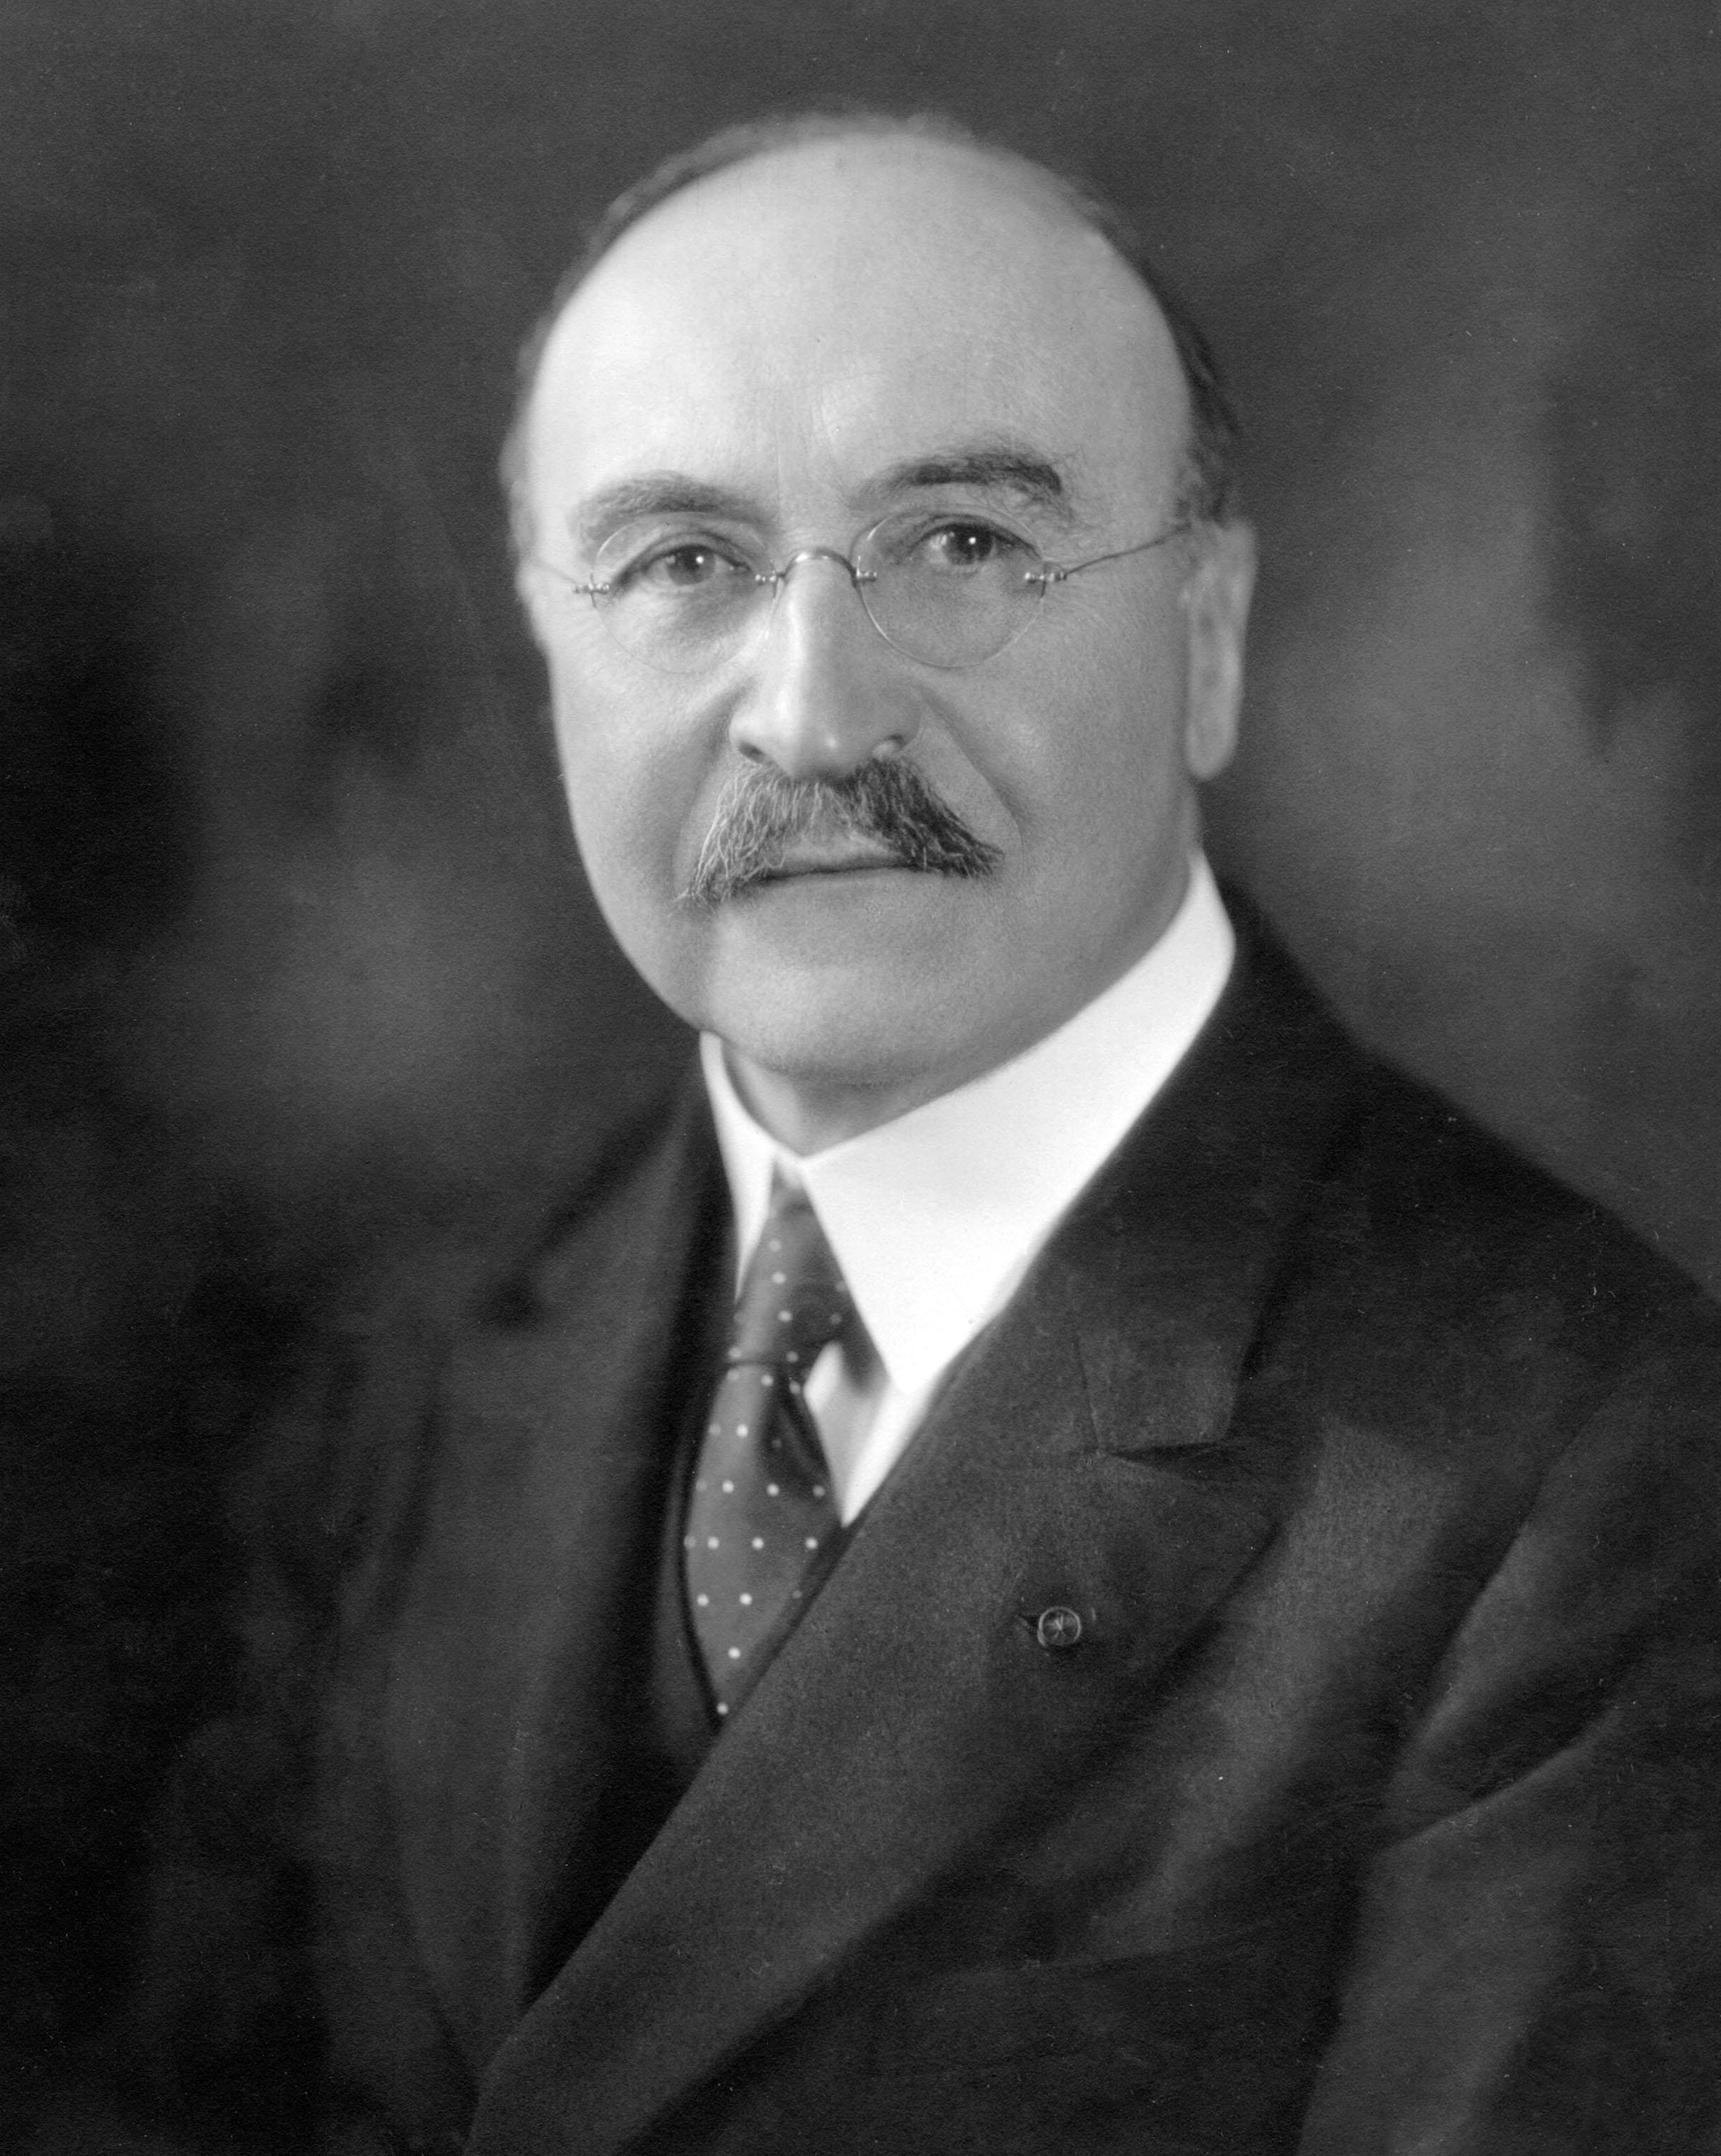 Leo Hendrik Baekeland 1843-1944. Bakelite